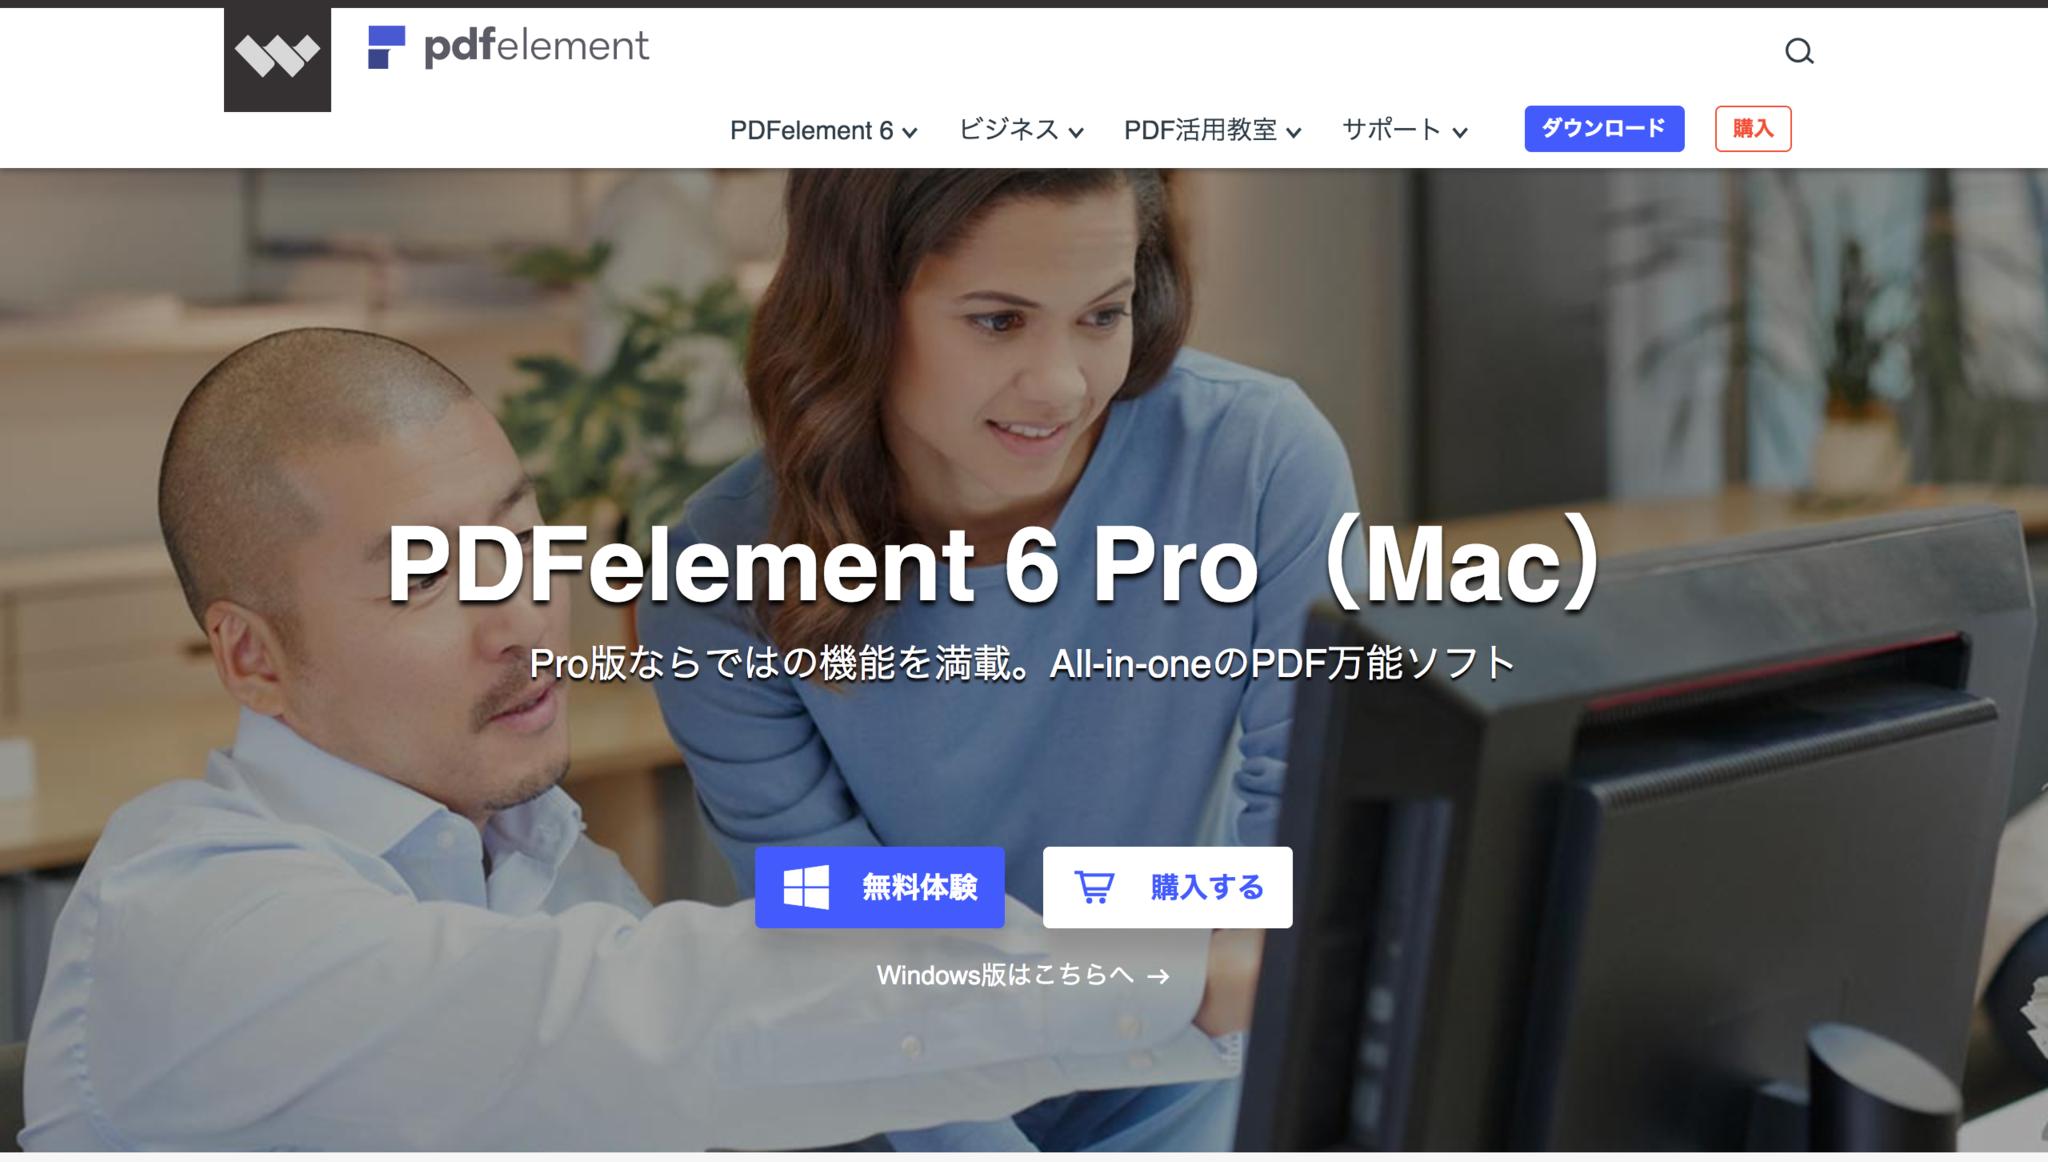 PDFelement_Pro(Mac)製品詳細___Wondershare_PDFelement.png